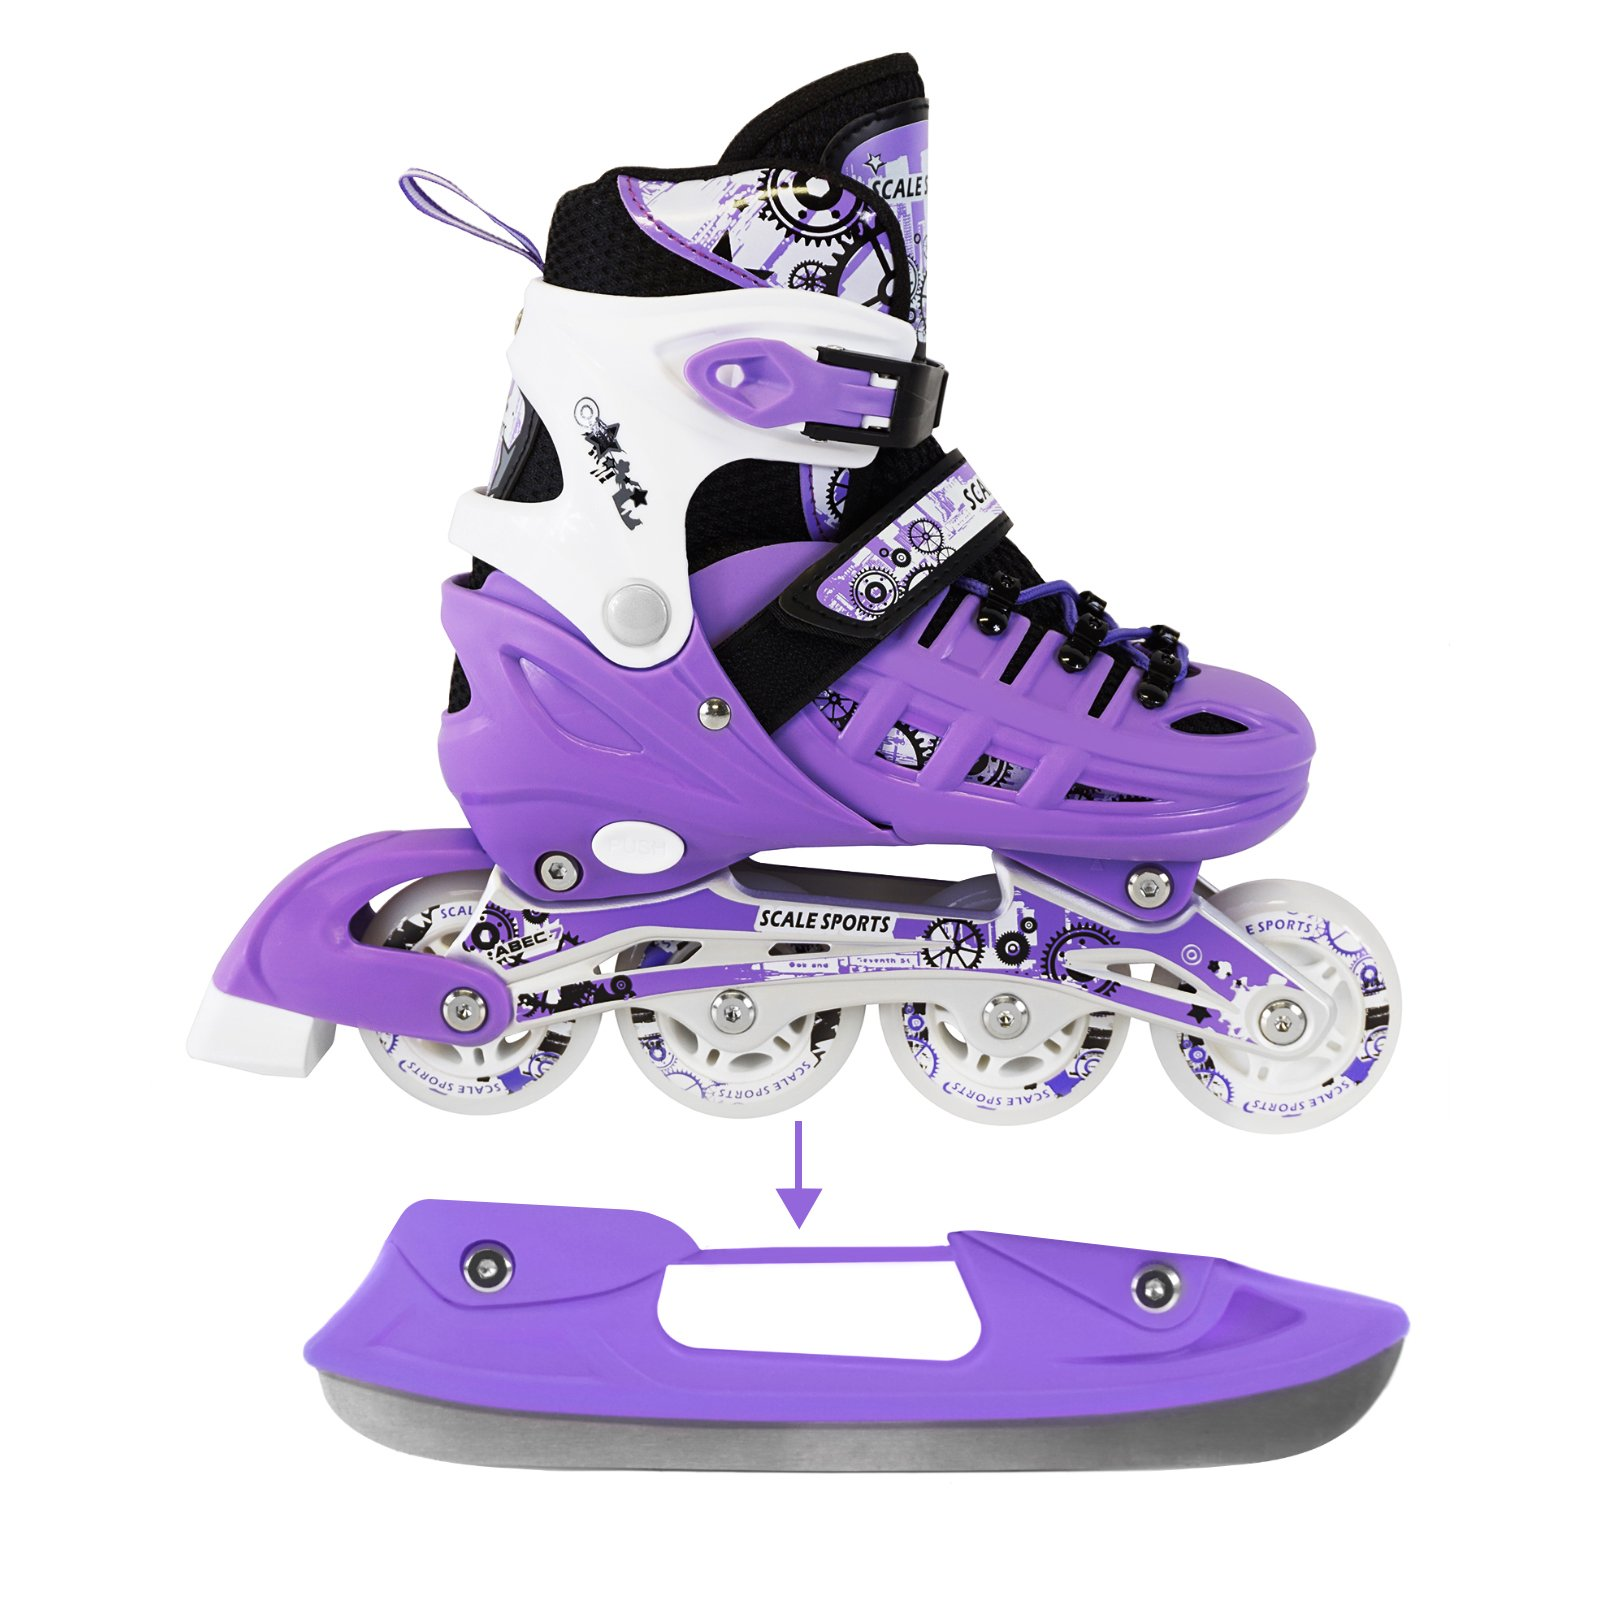 Adjustable Purple Inline Skates Ice Skates Combo Pack Gift Boxed for Kids Boys Girls Ladies Teens Size Medium